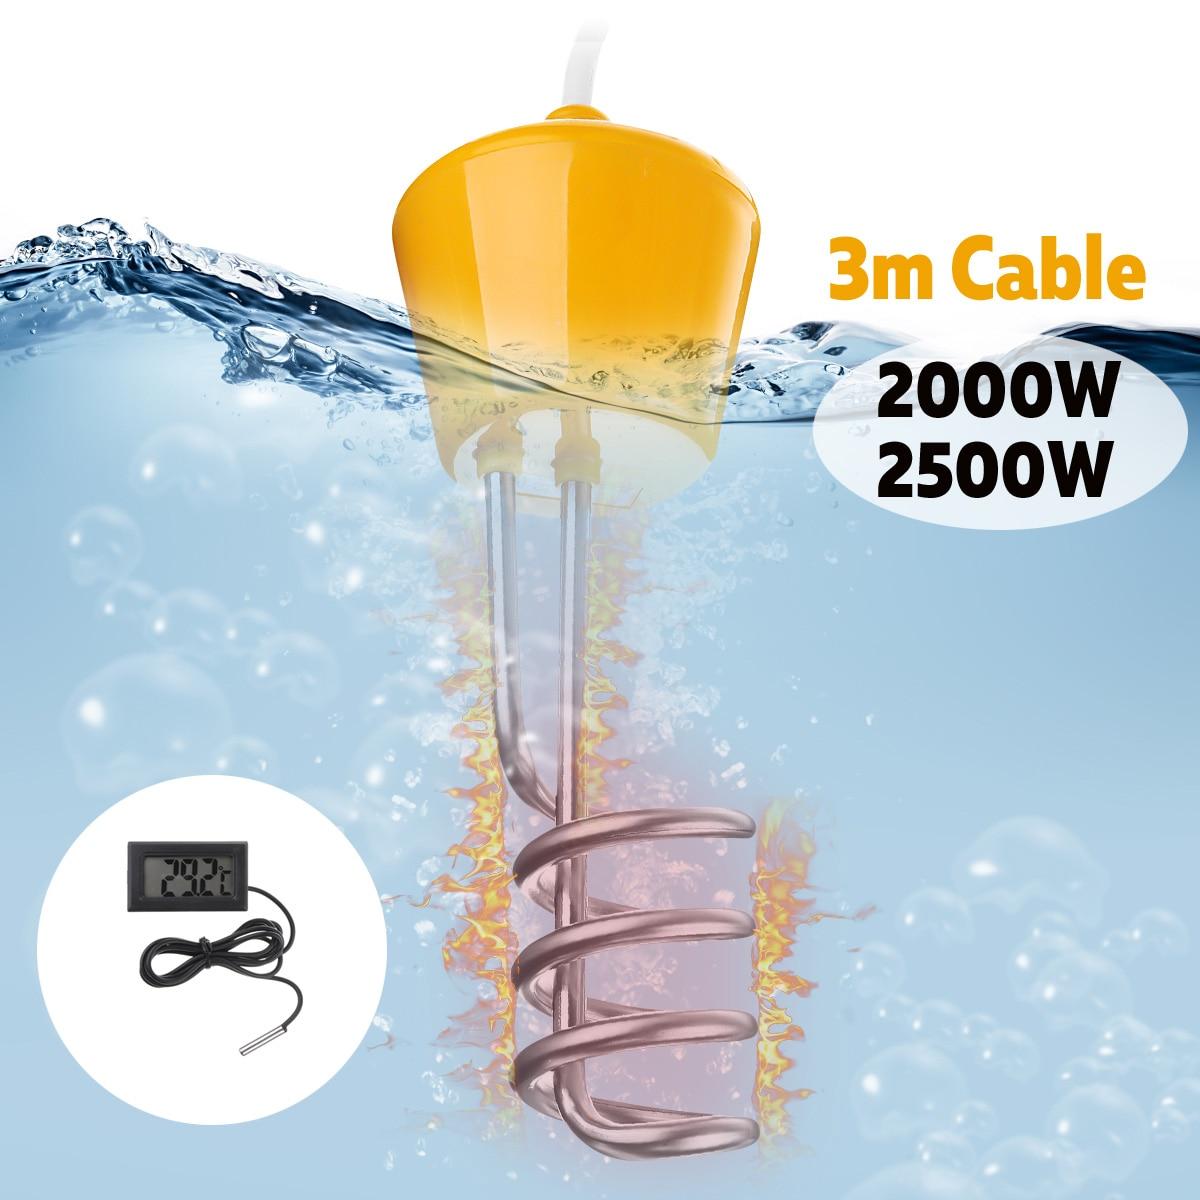 2000W/2500W Portable Suspension Electric Water Hea